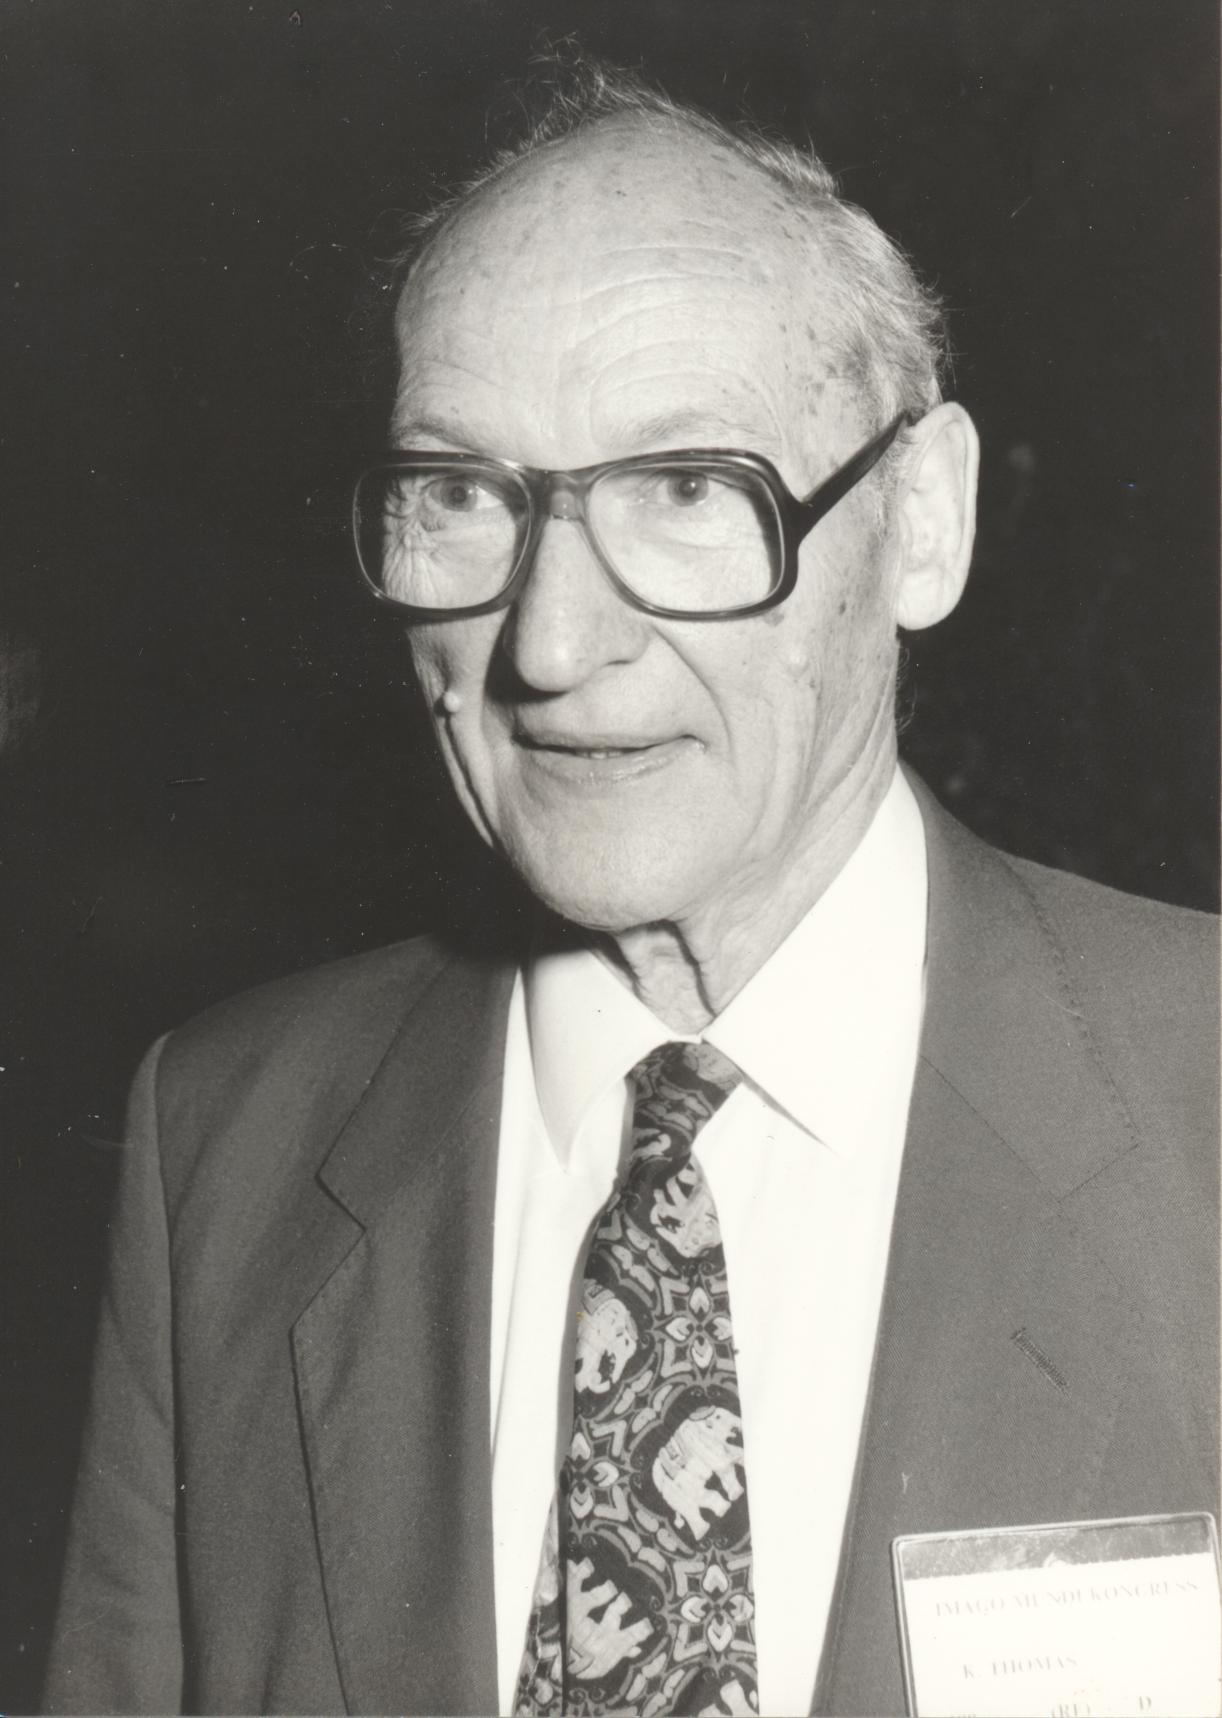 XII. Imago Mundi-Kongress 1989, Innsbruck, Dr. Dr. Klaus Thomas